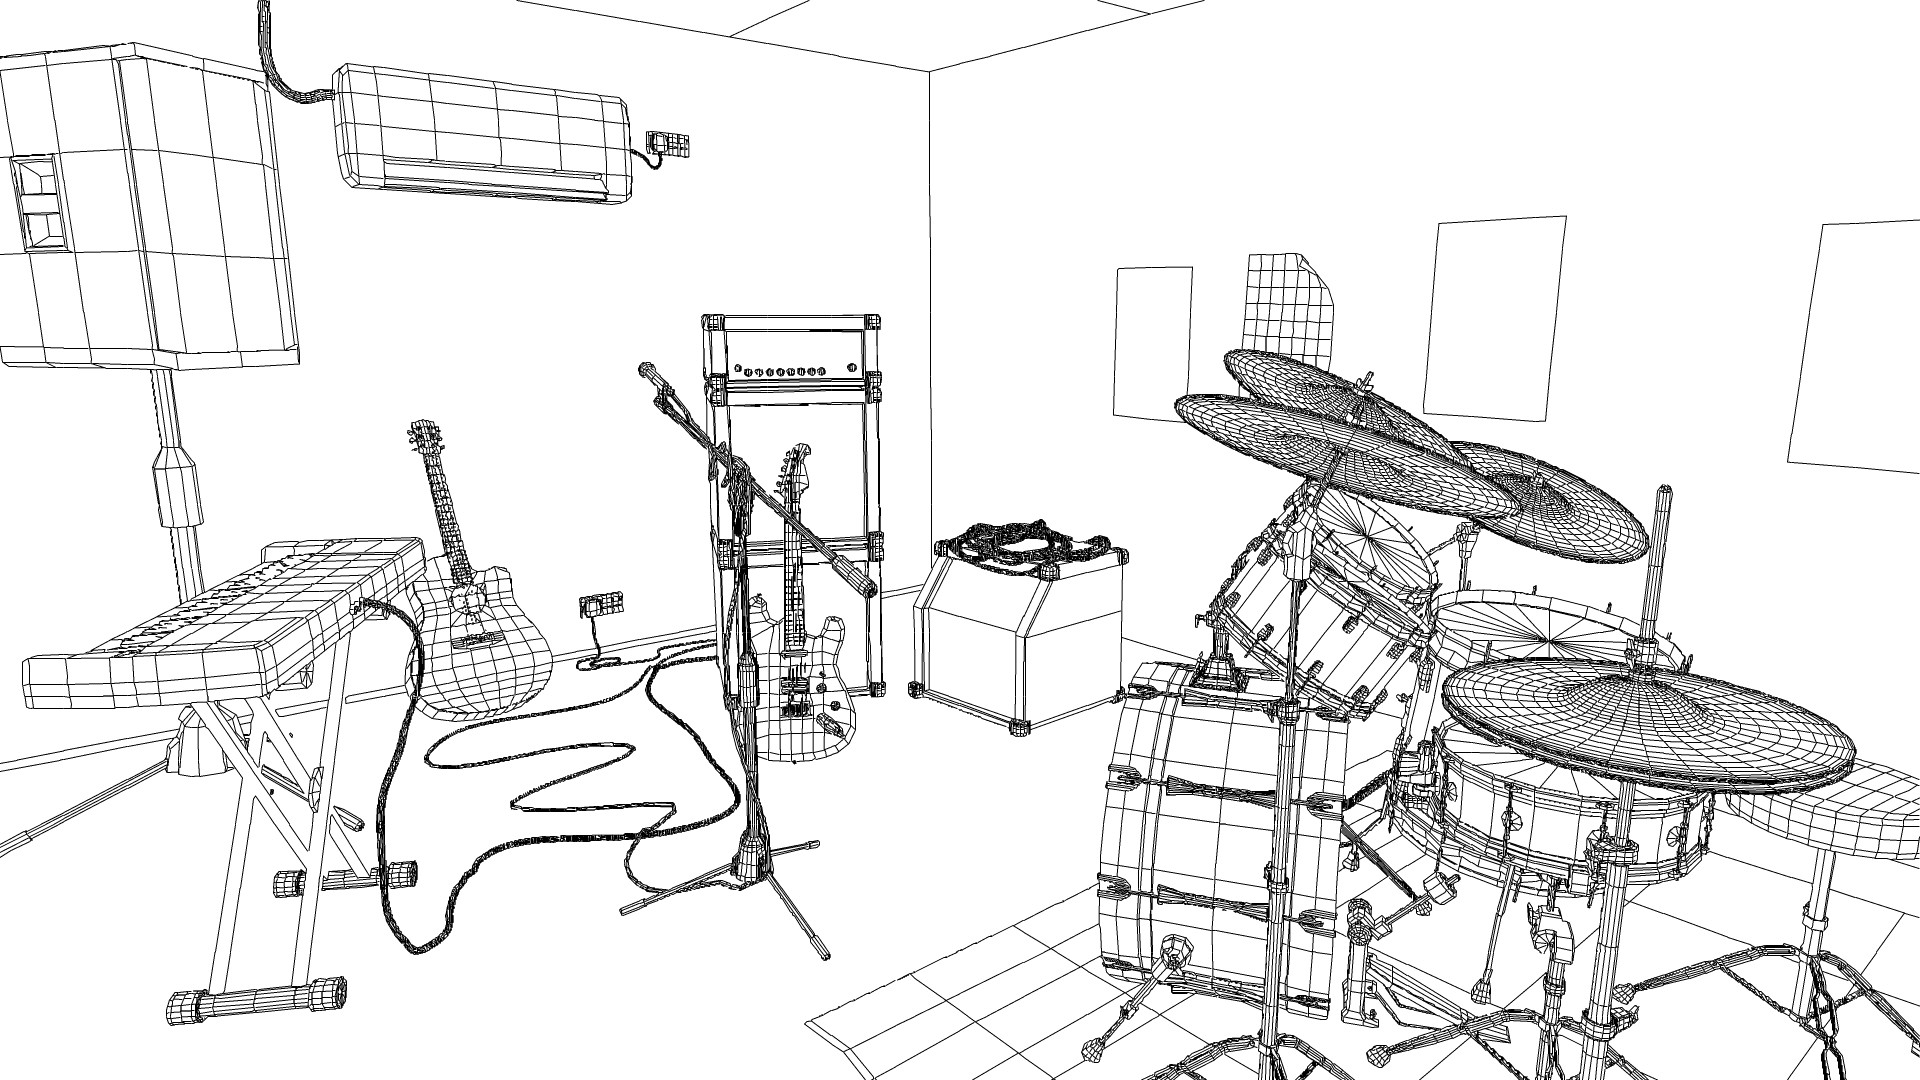 kyle tew the band roomkyle tew dan143 1 2 interior tewkaien 09 [ 1920 x 1080 Pixel ]